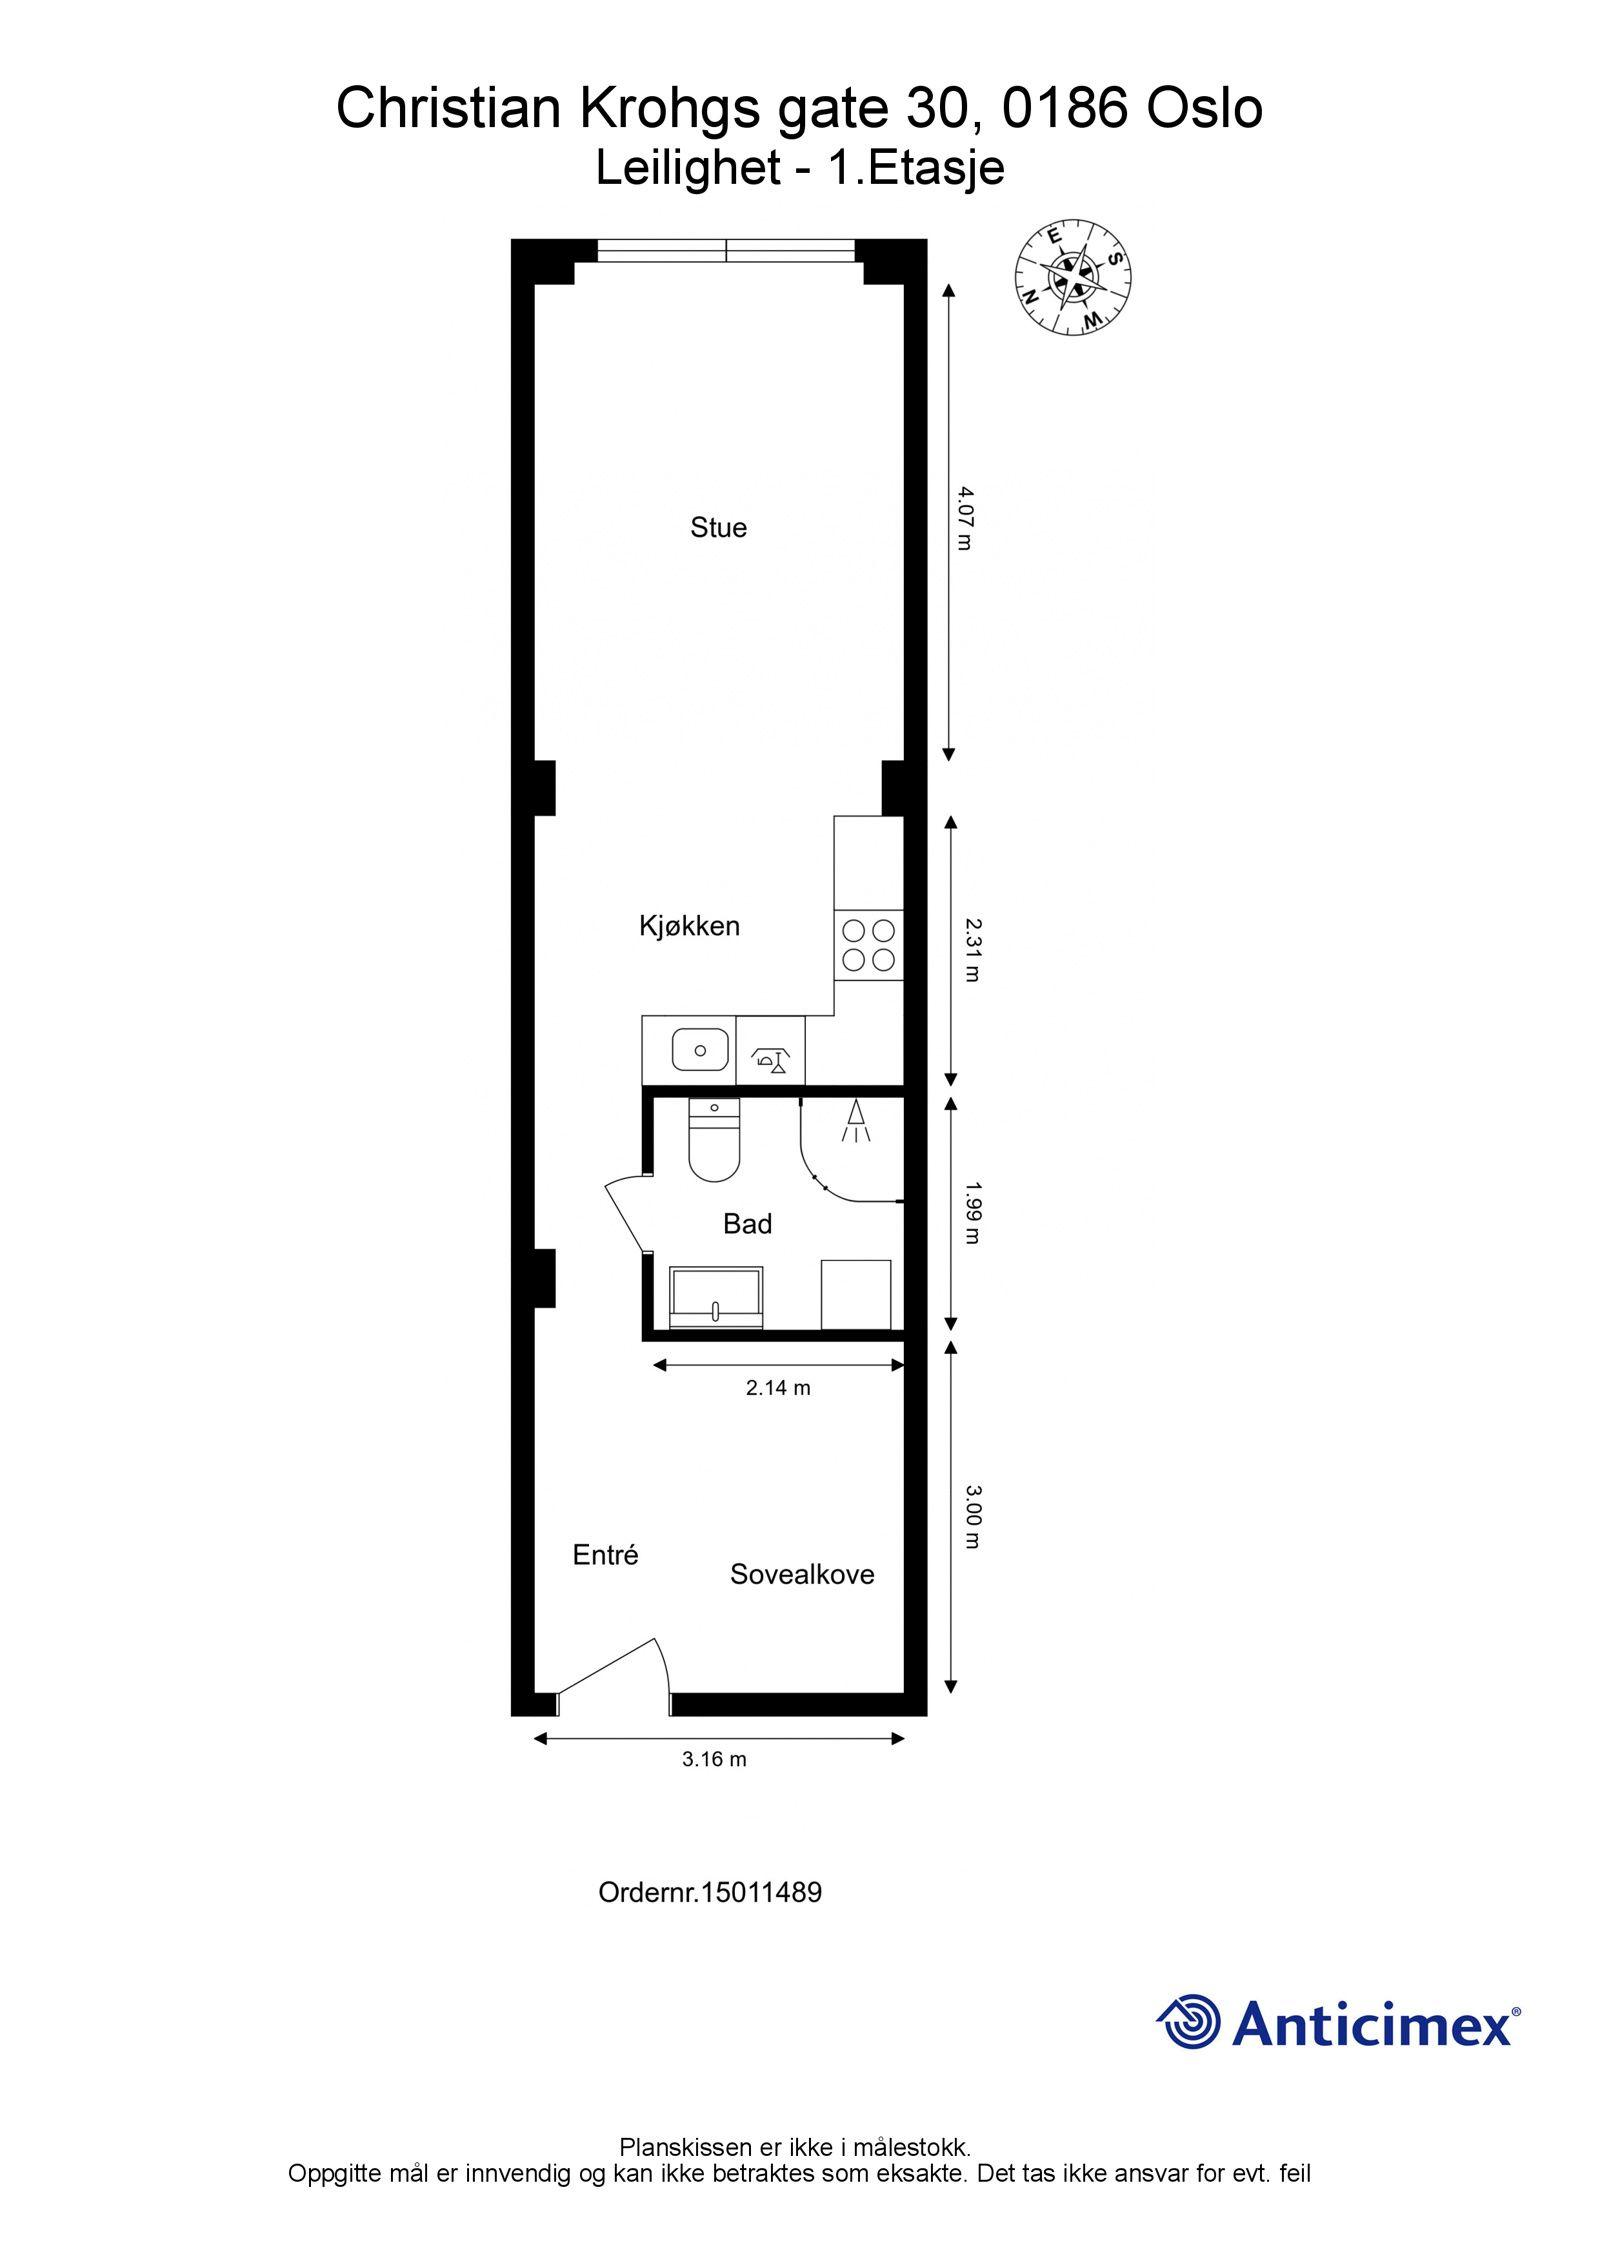 Christian Krohgs gate 30 Plantegning i 2D med mål og kompass.